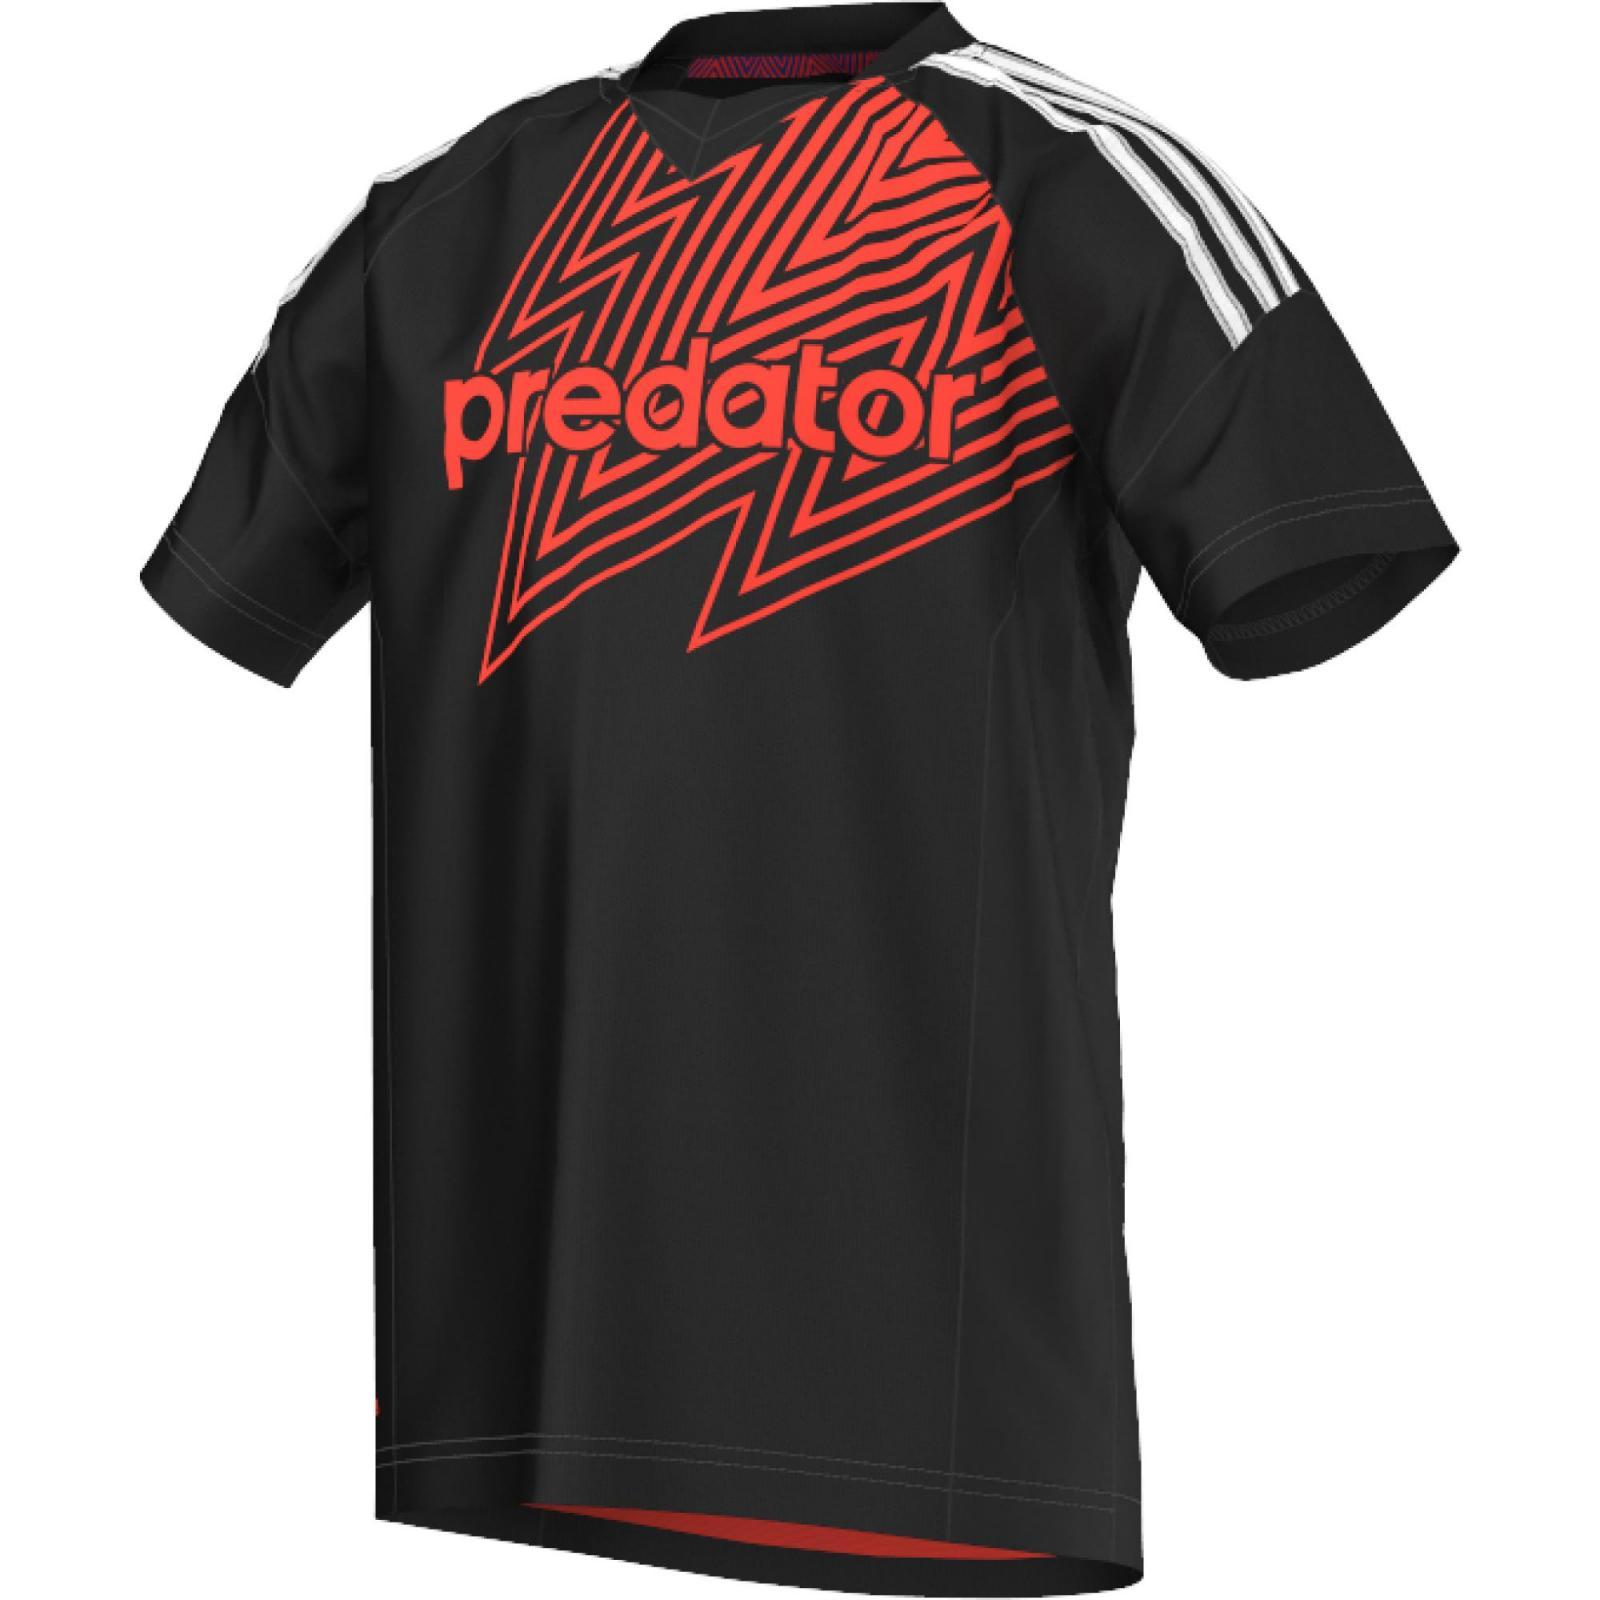 Camiseta Predator negra-roja S88062